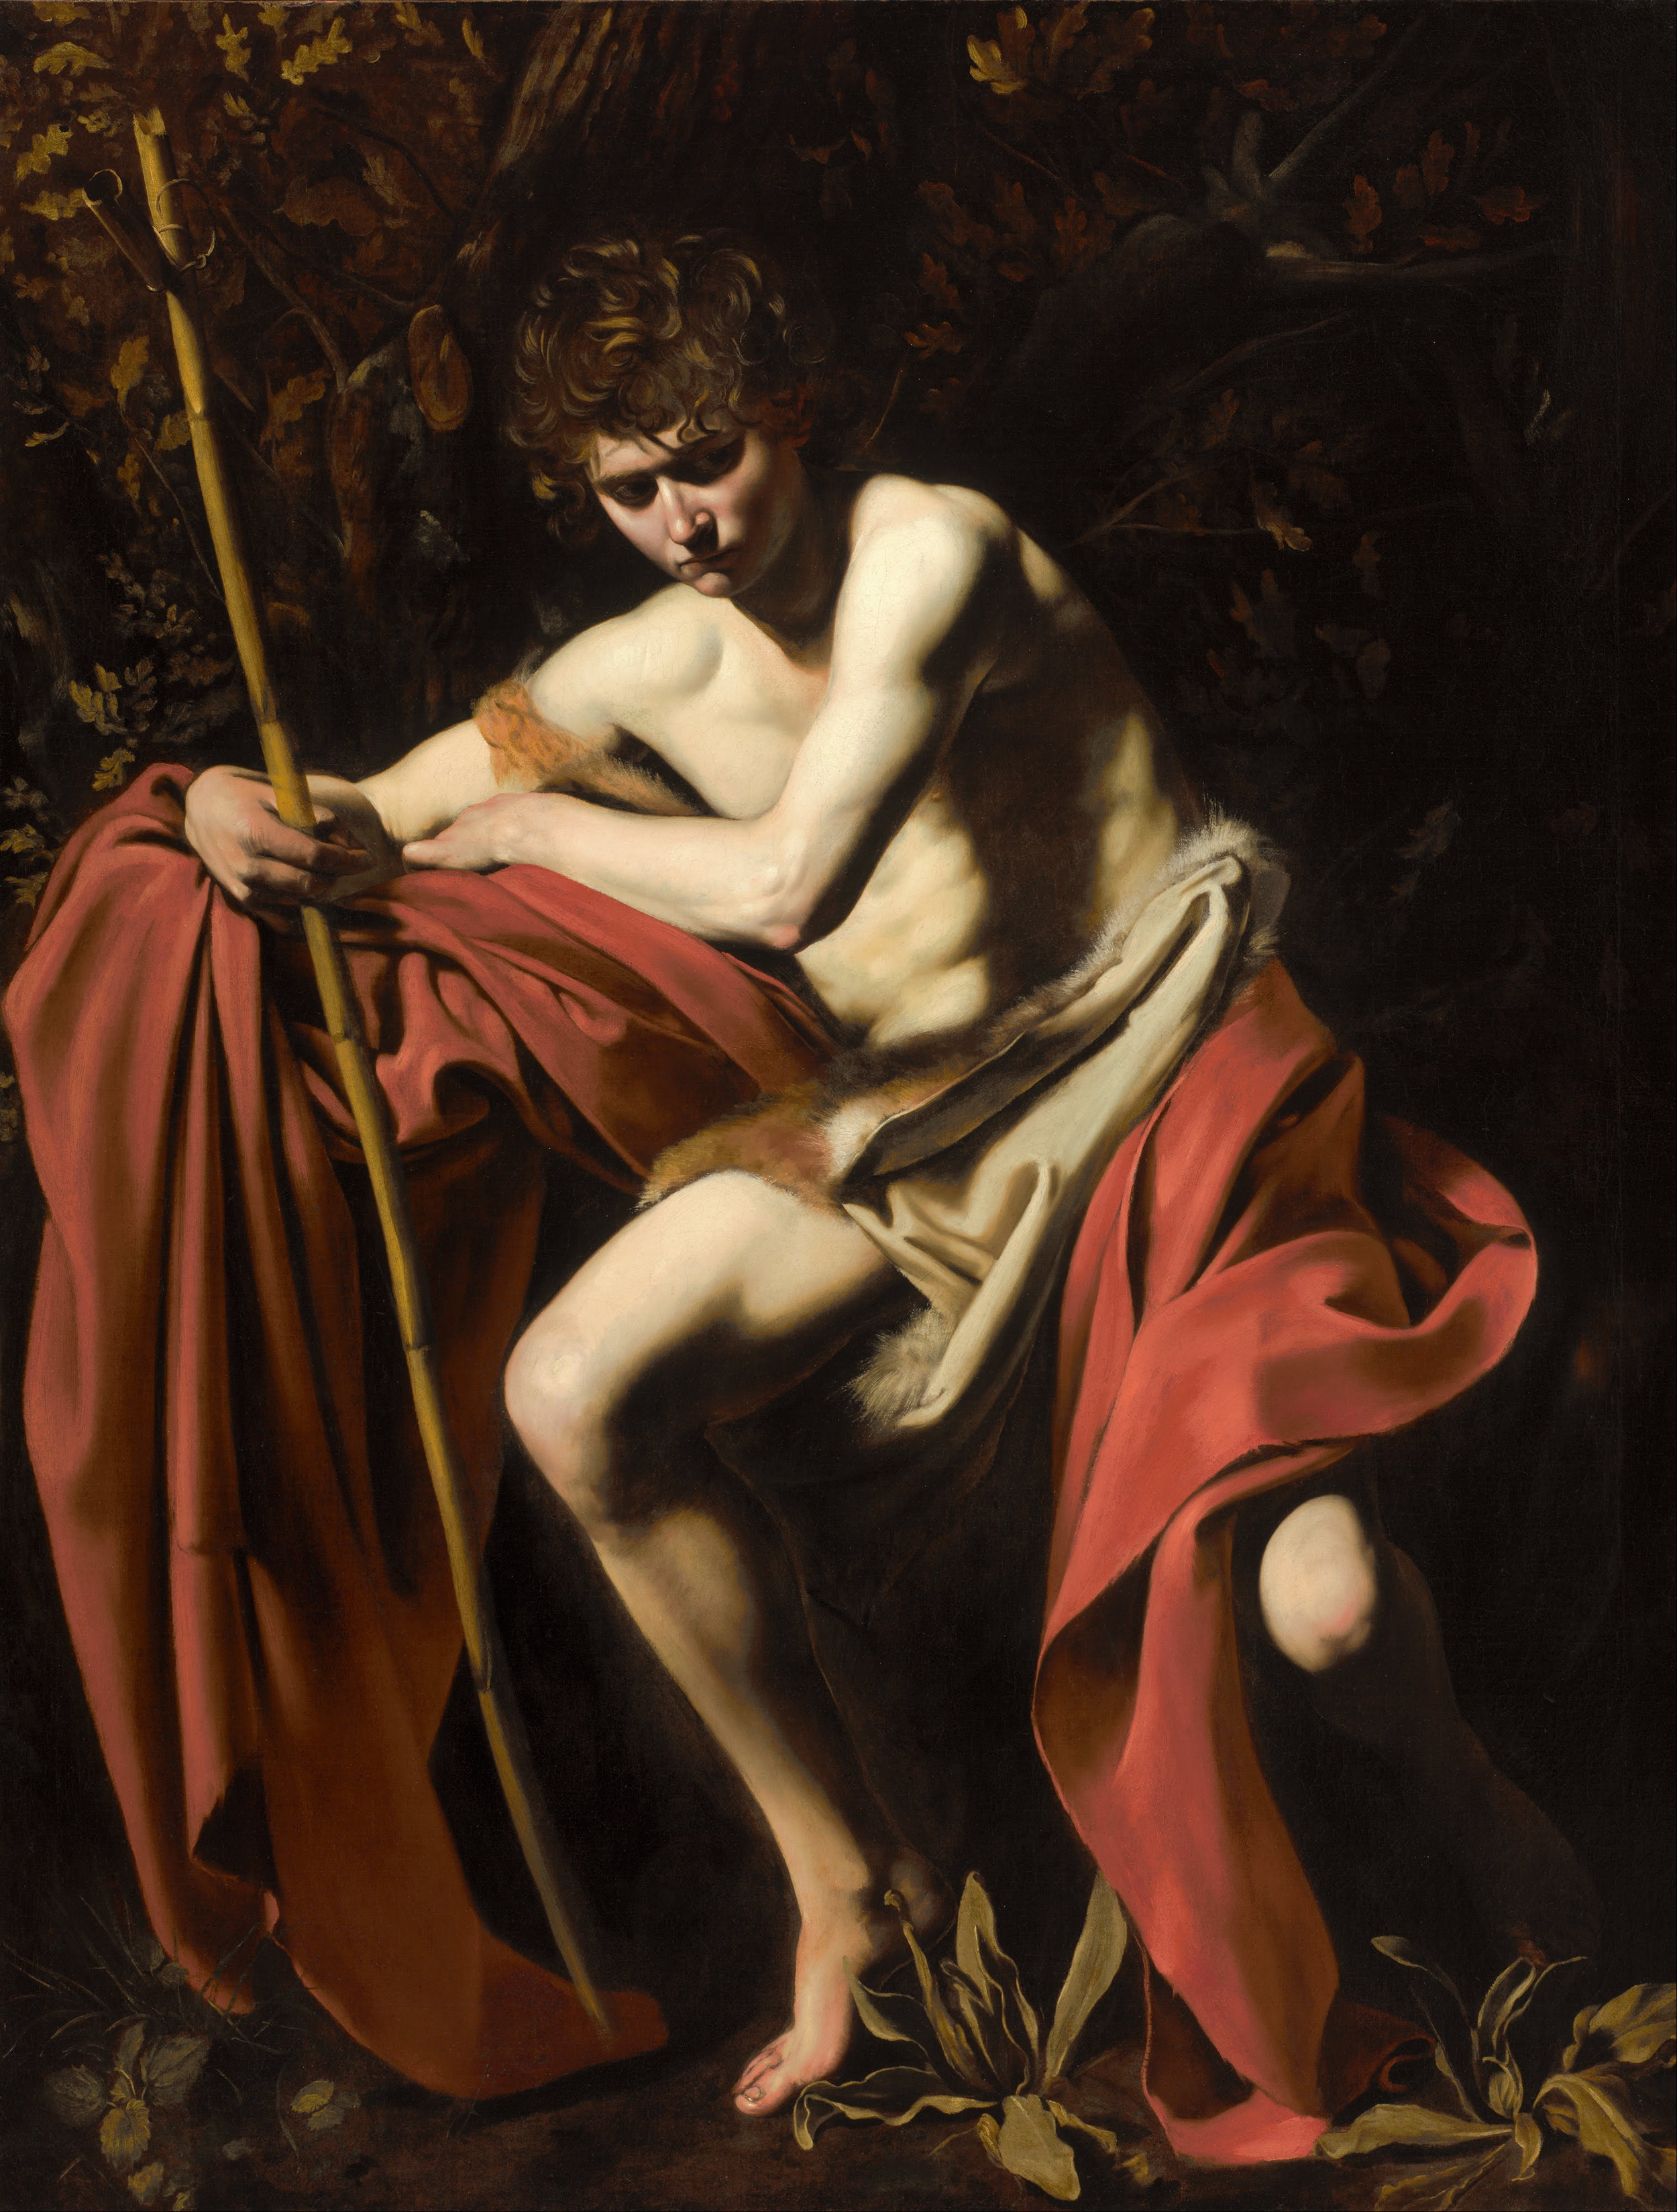 John the Baptist by Caravaggio